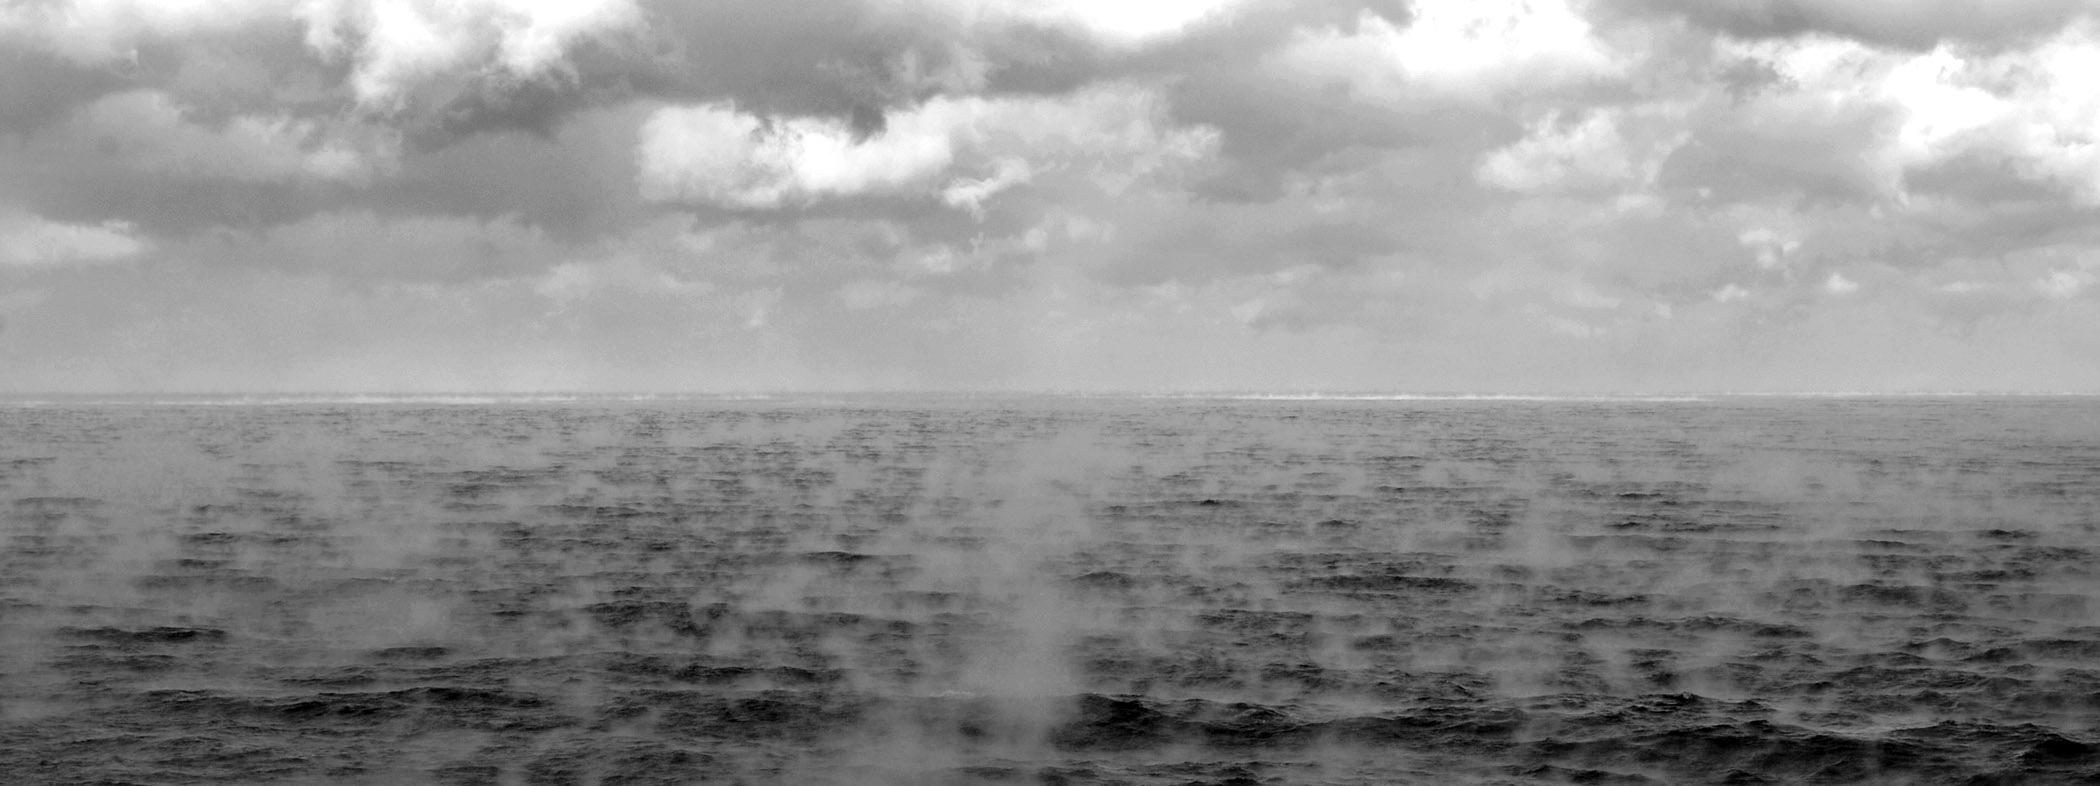 File:SeaSmoke.jpg - Wikimedia Commons | title